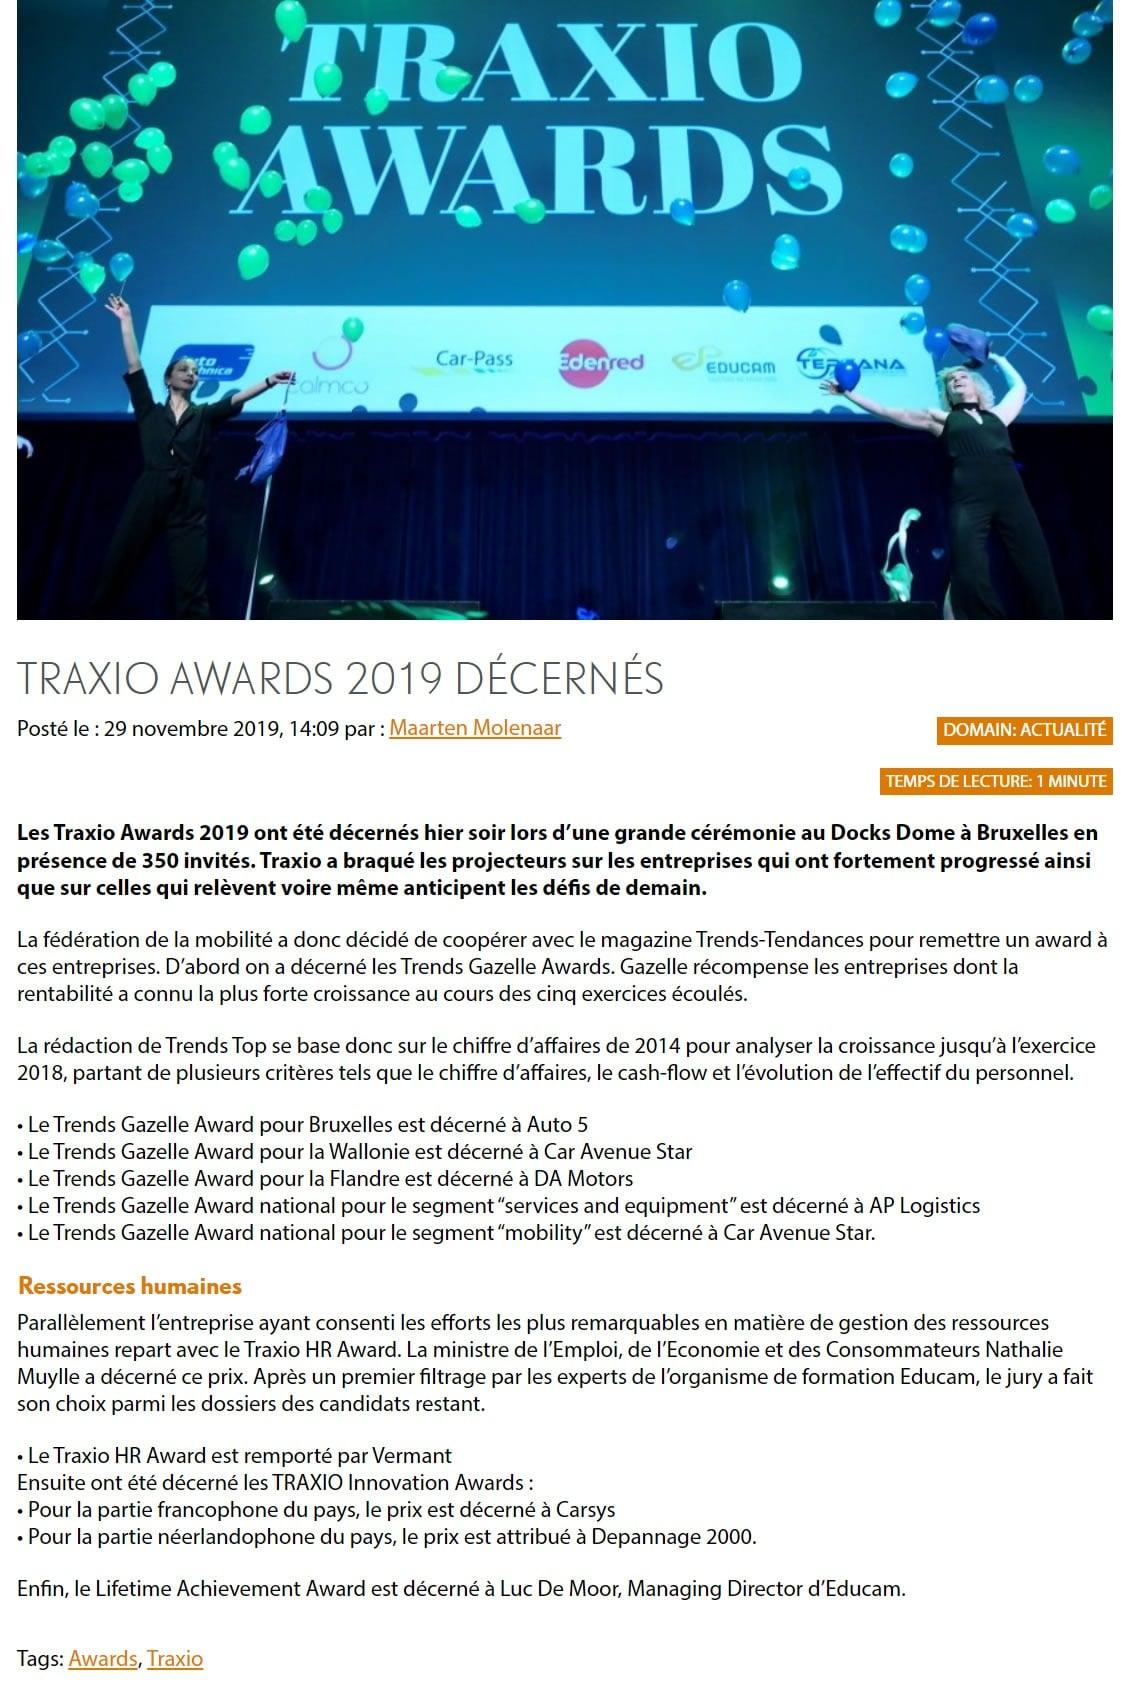 Traxio Awards 2019 décernés